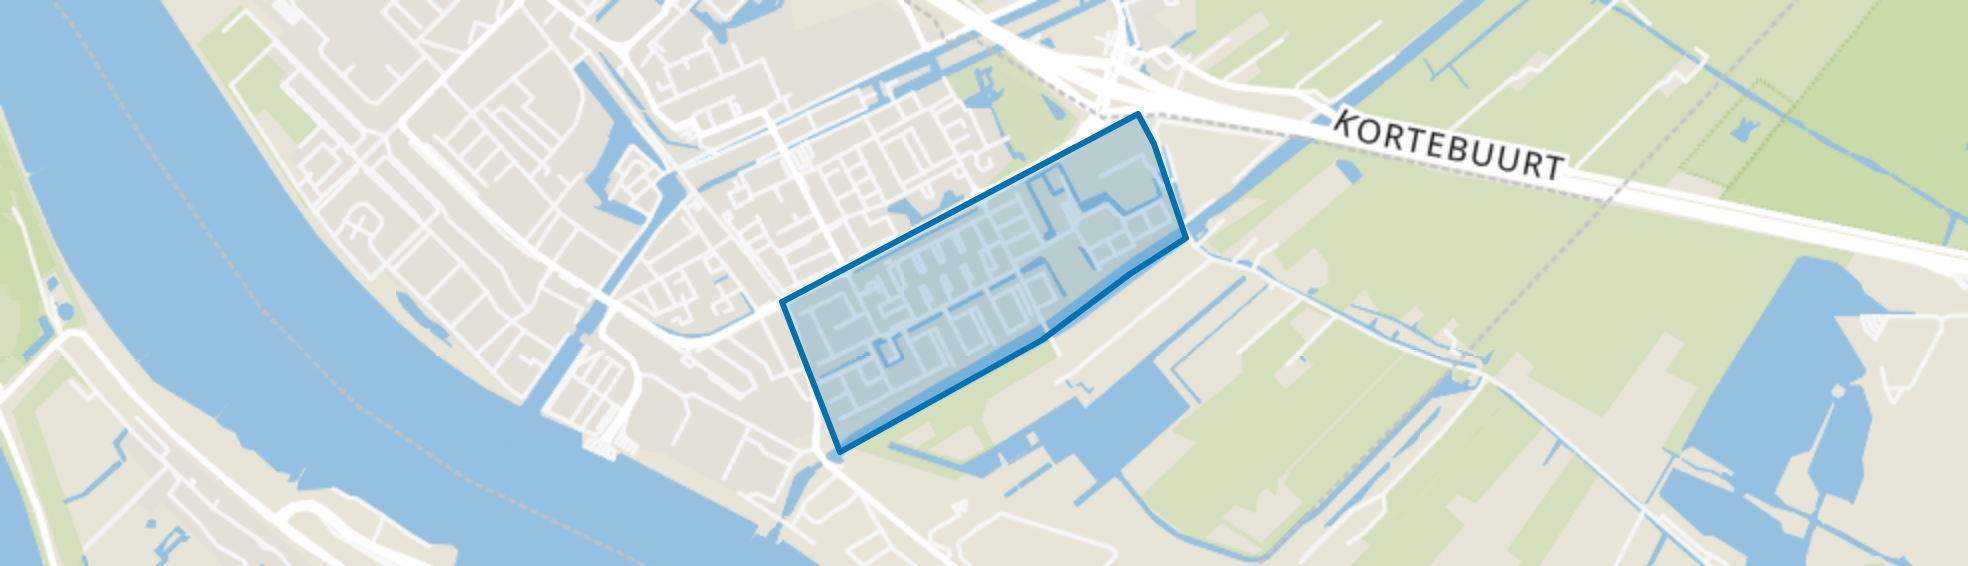 Sluispolder Oost, Maassluis map